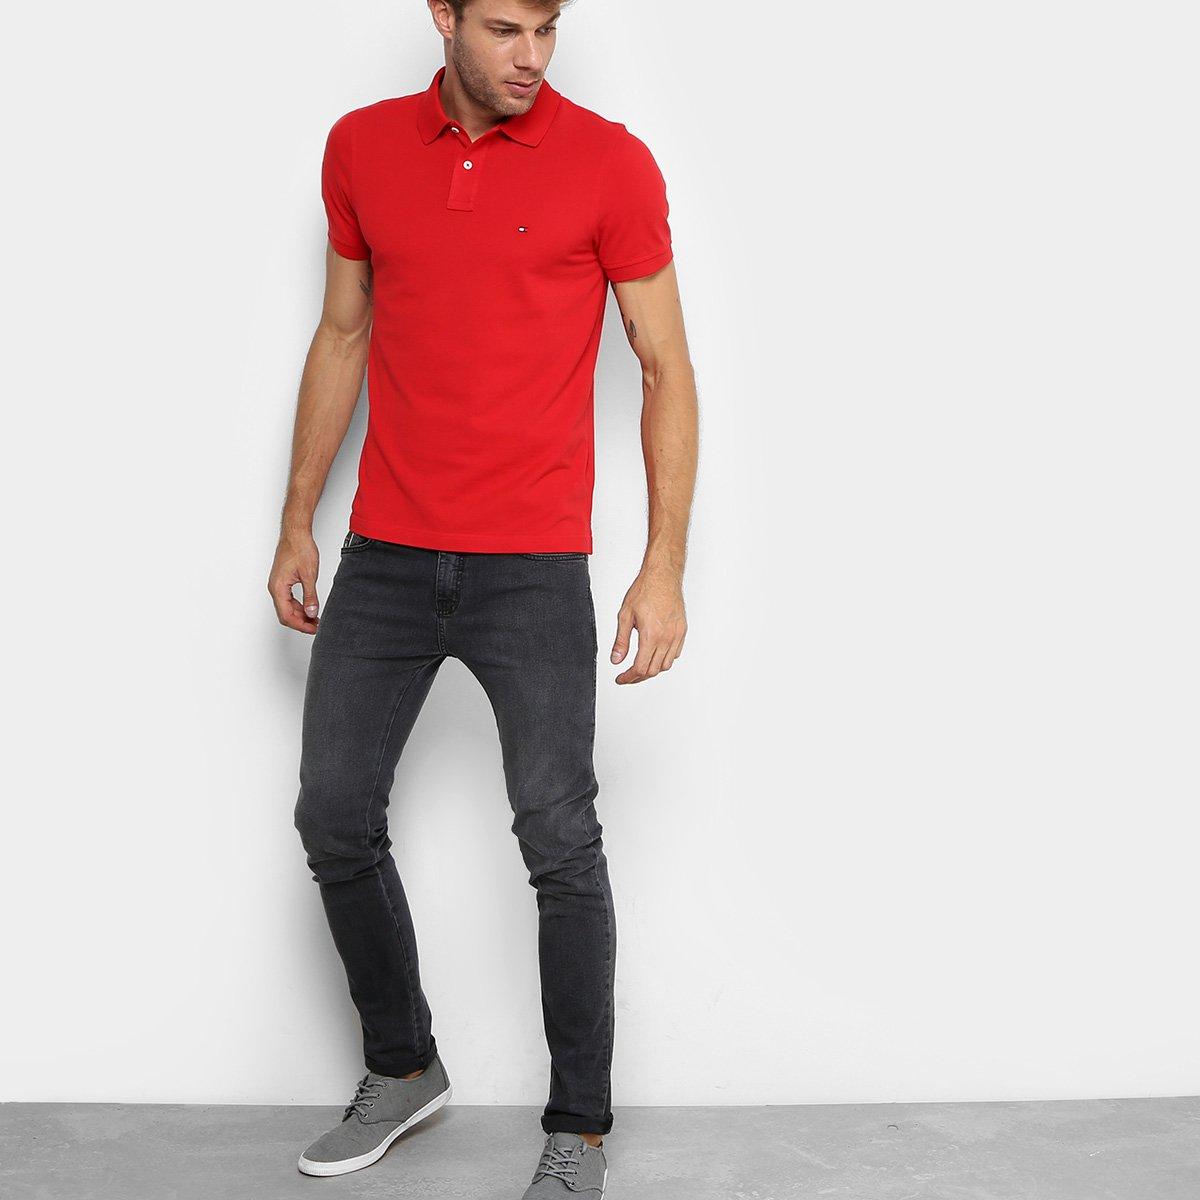 487729b5fd3 Camisa Polo Tommy Hilfiger Slim Fit Clássica Masculina